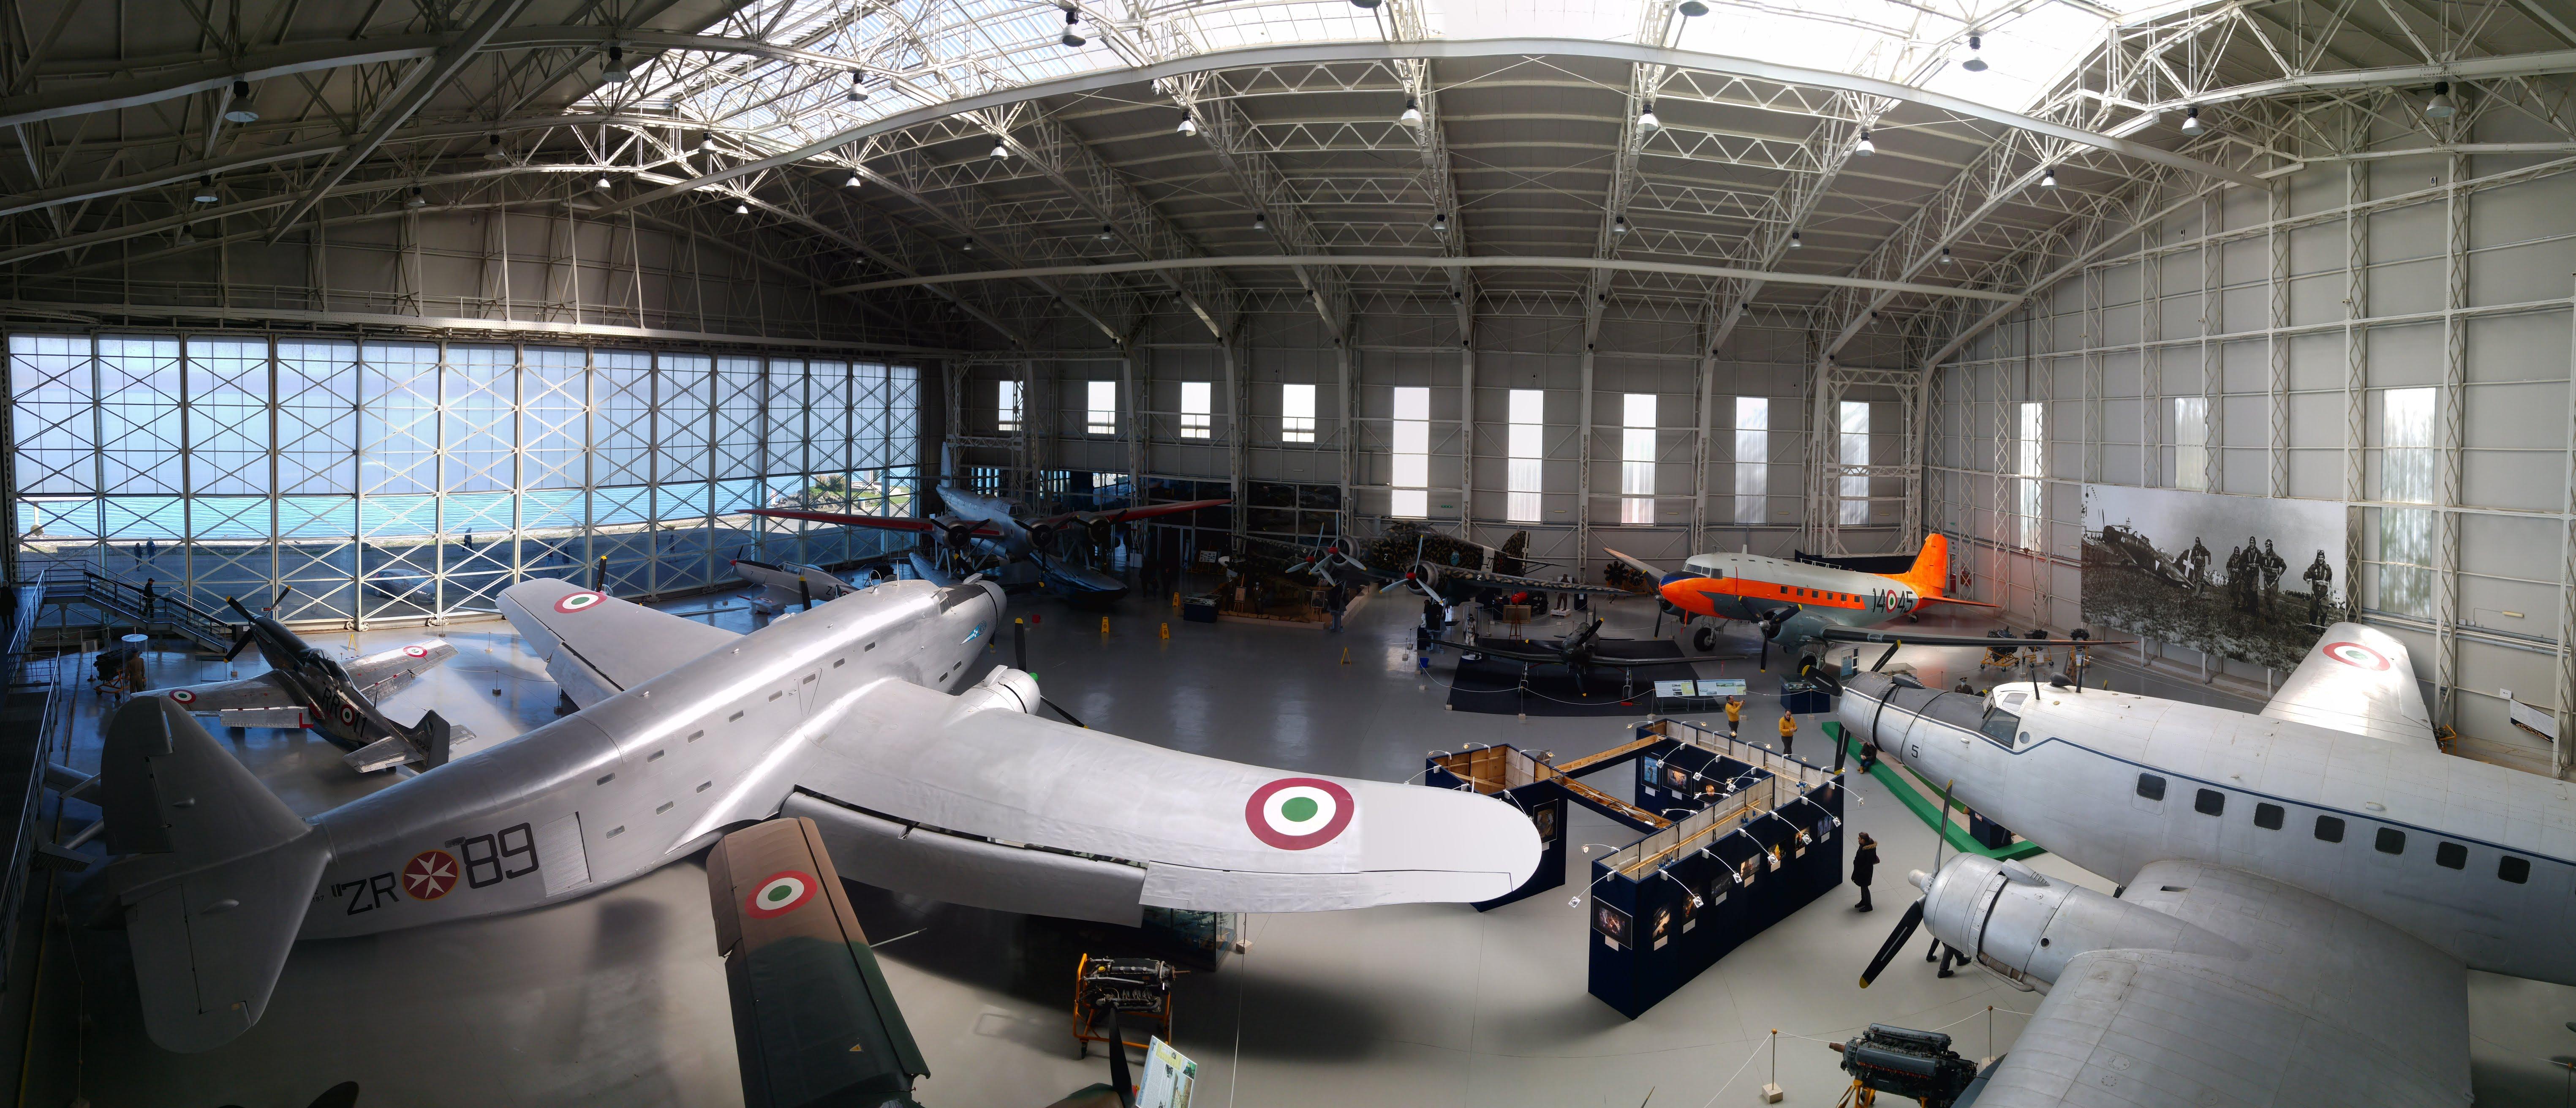 museo_aerei_bracciano